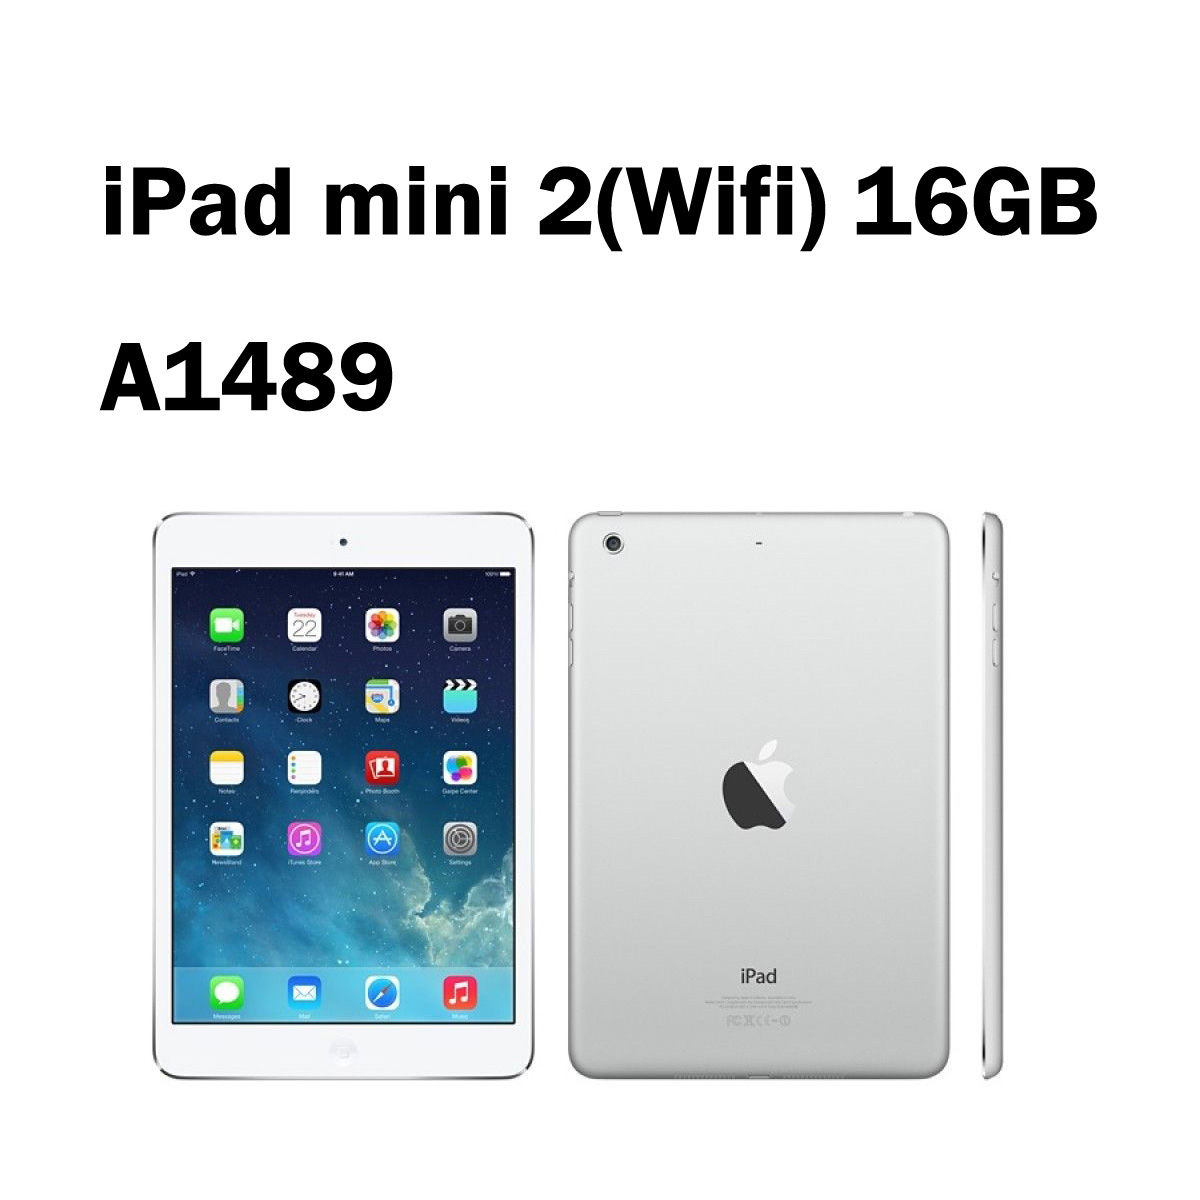 iPad mini 2 Wi-Fi:A1489 16GB 7.9インチ アップル 中古 タブレット 【シルバー】【ランクB】【中古】